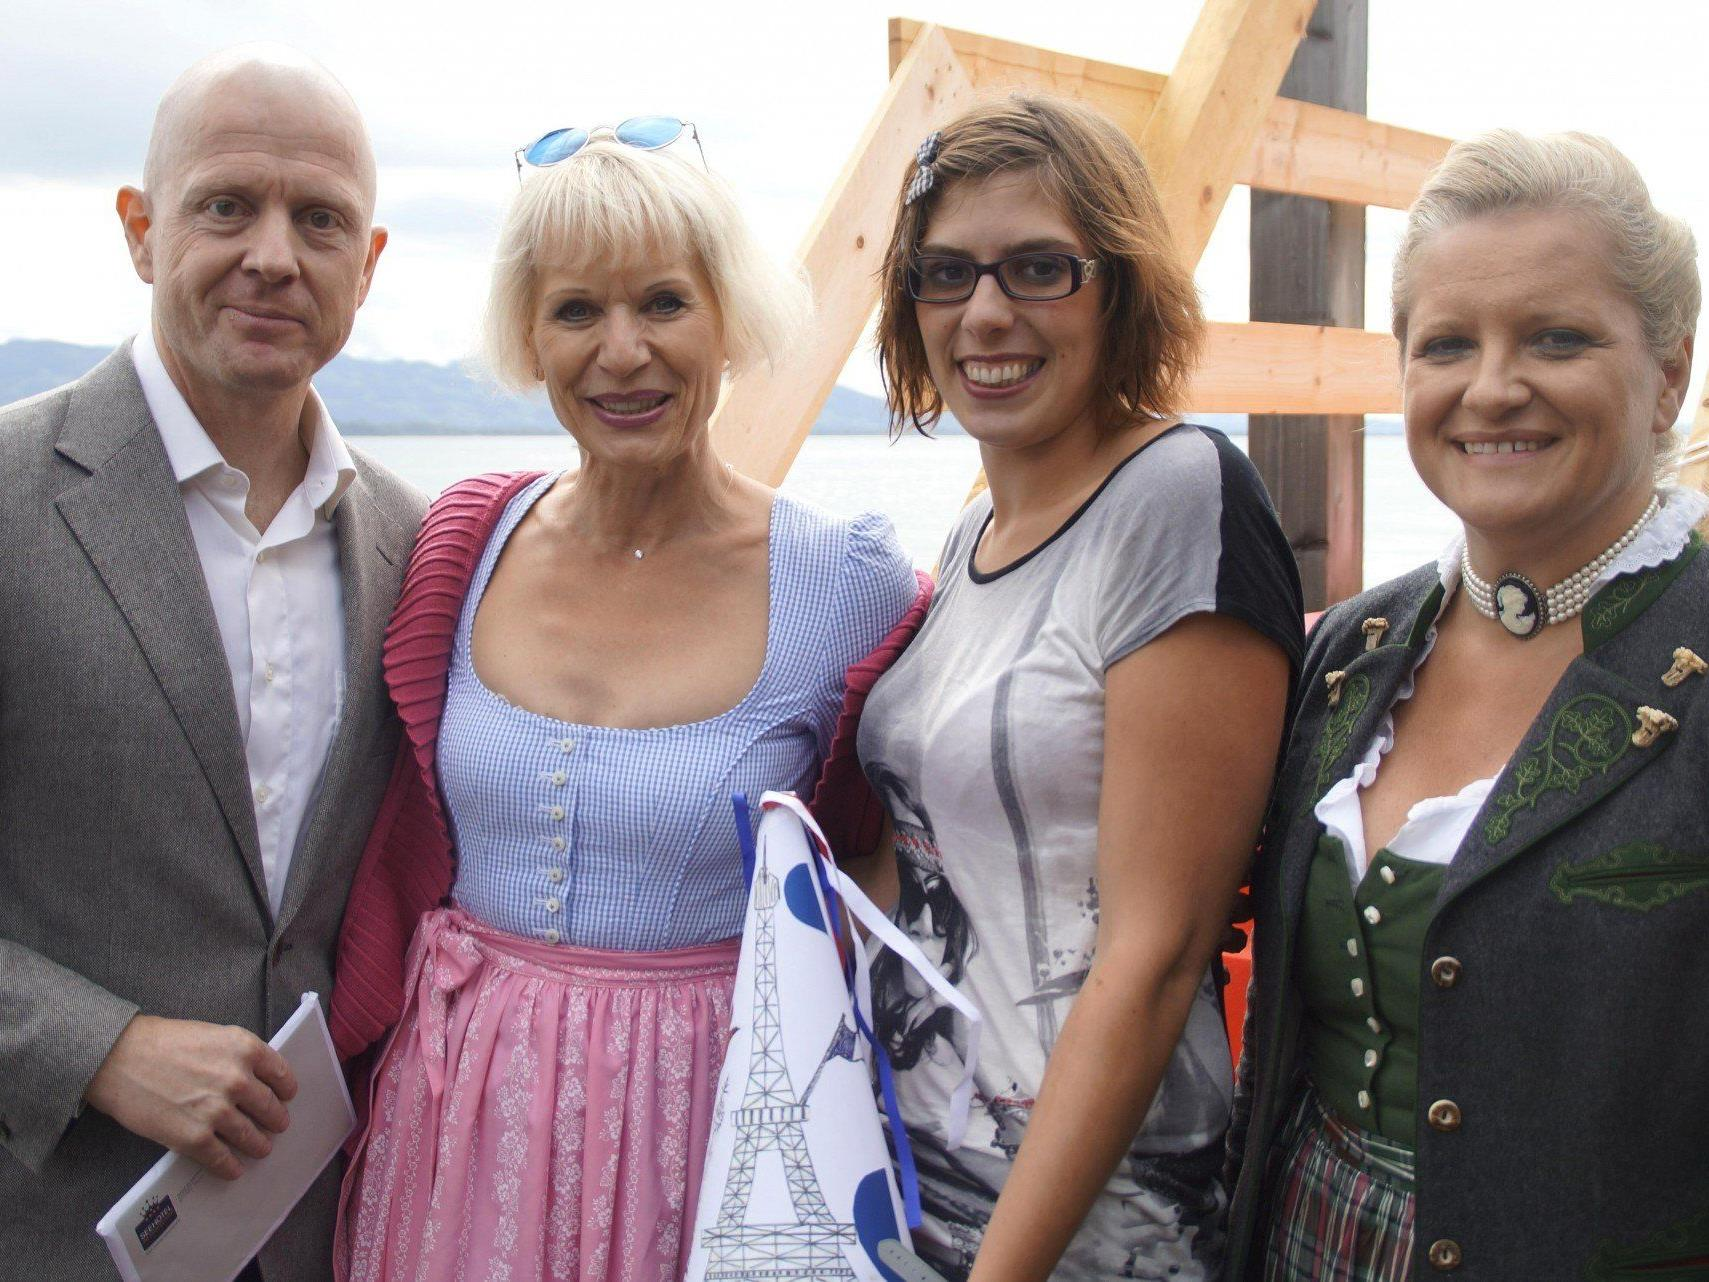 Seehotel-Direktor Horst Fallosch, Heilwig Pfanzelter, Siegerin Marie Guny und Andrea Forer